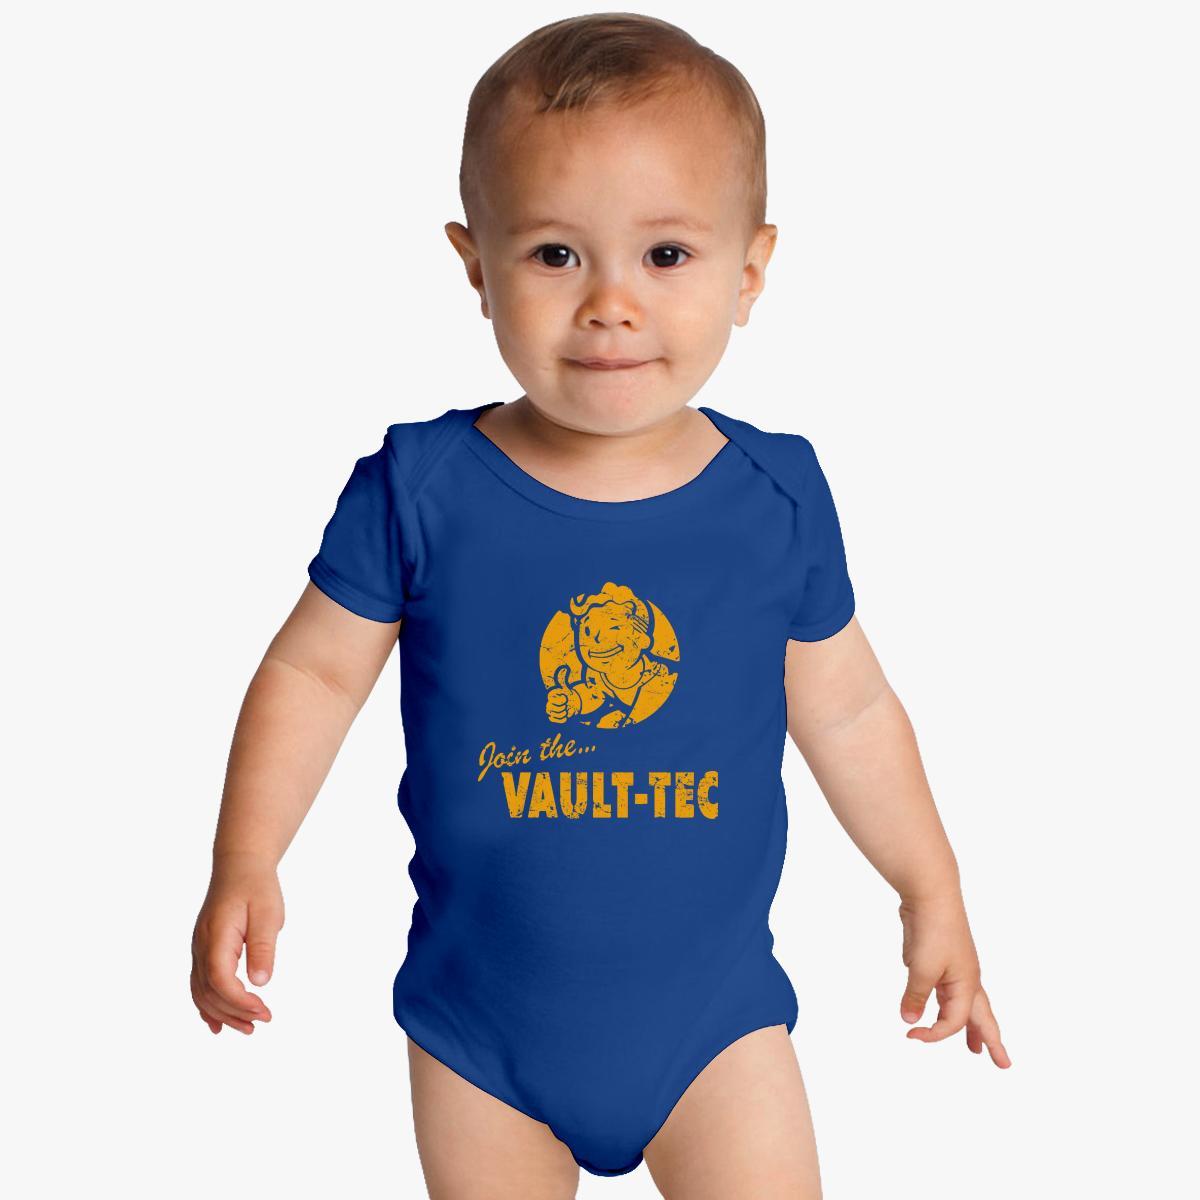 Fallout Vault Tec Baby Onesies | Customon.com